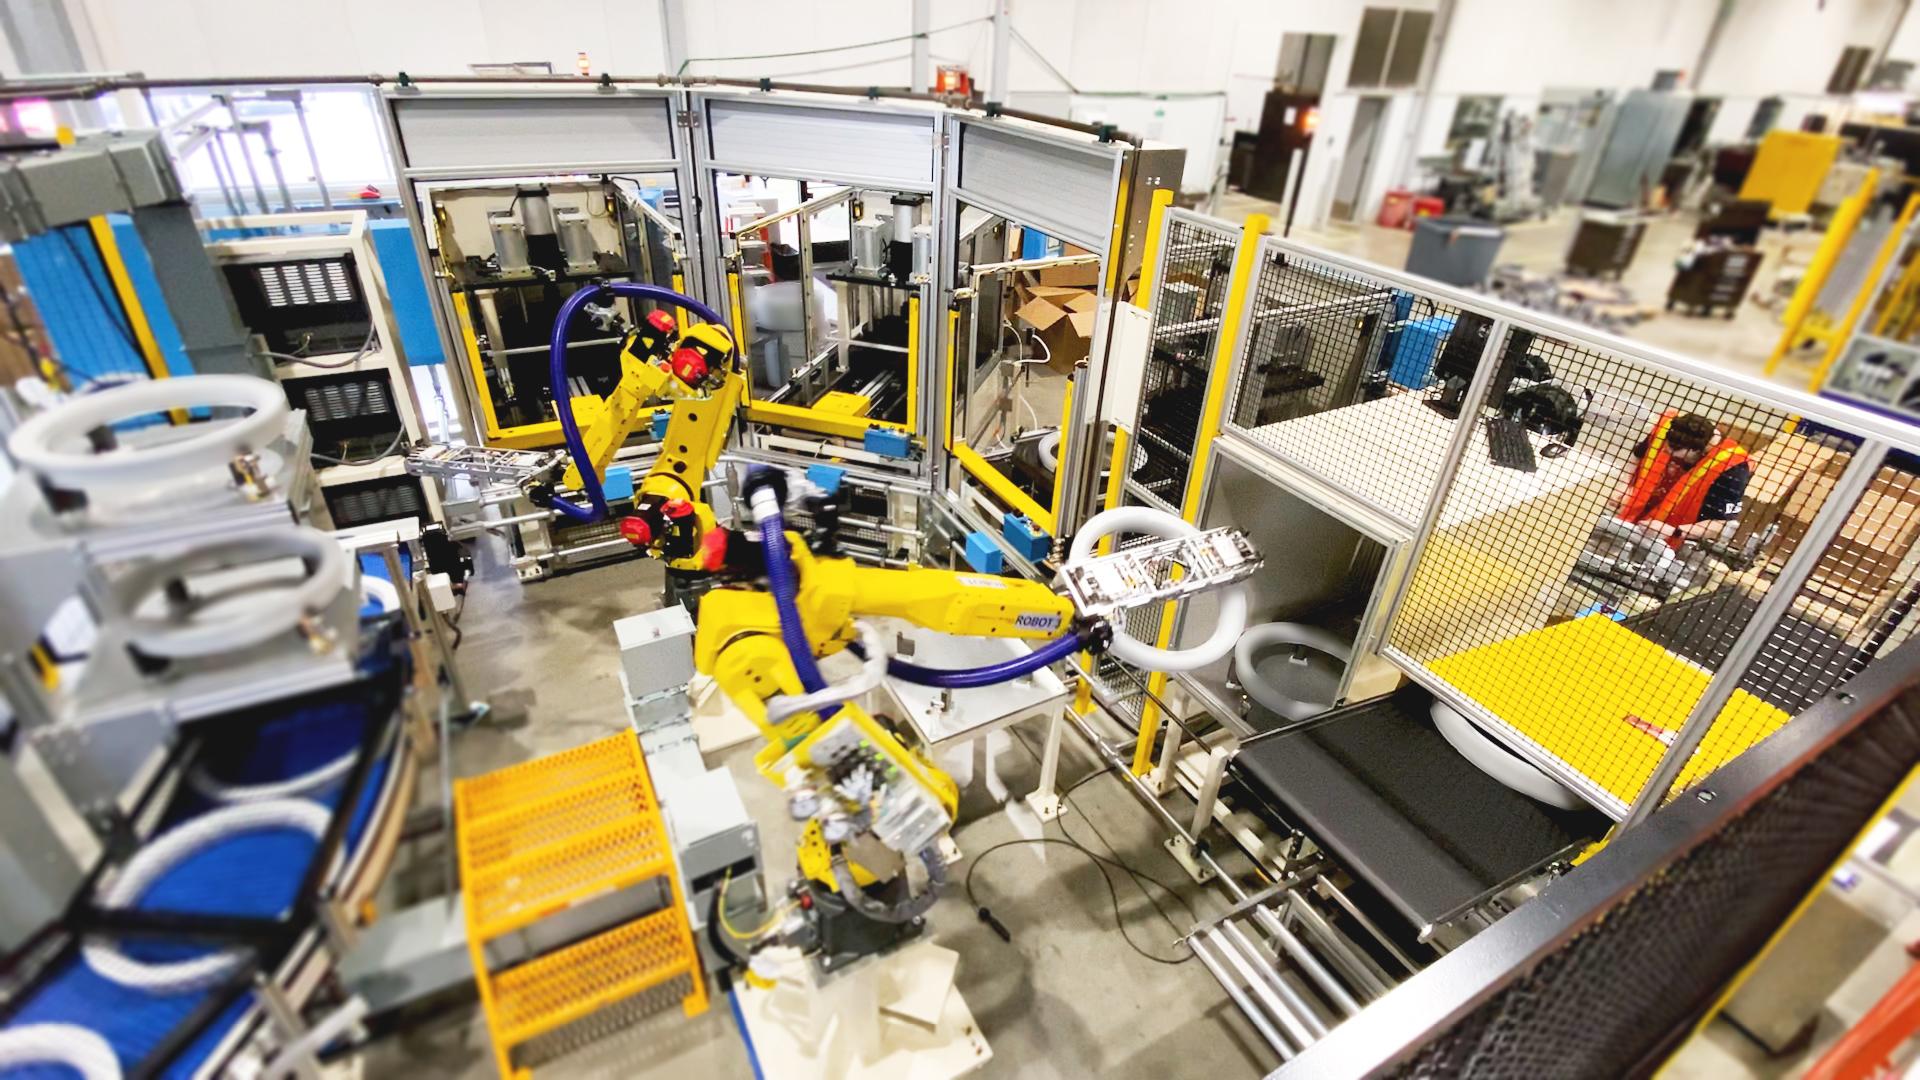 Custom automation machine with robots